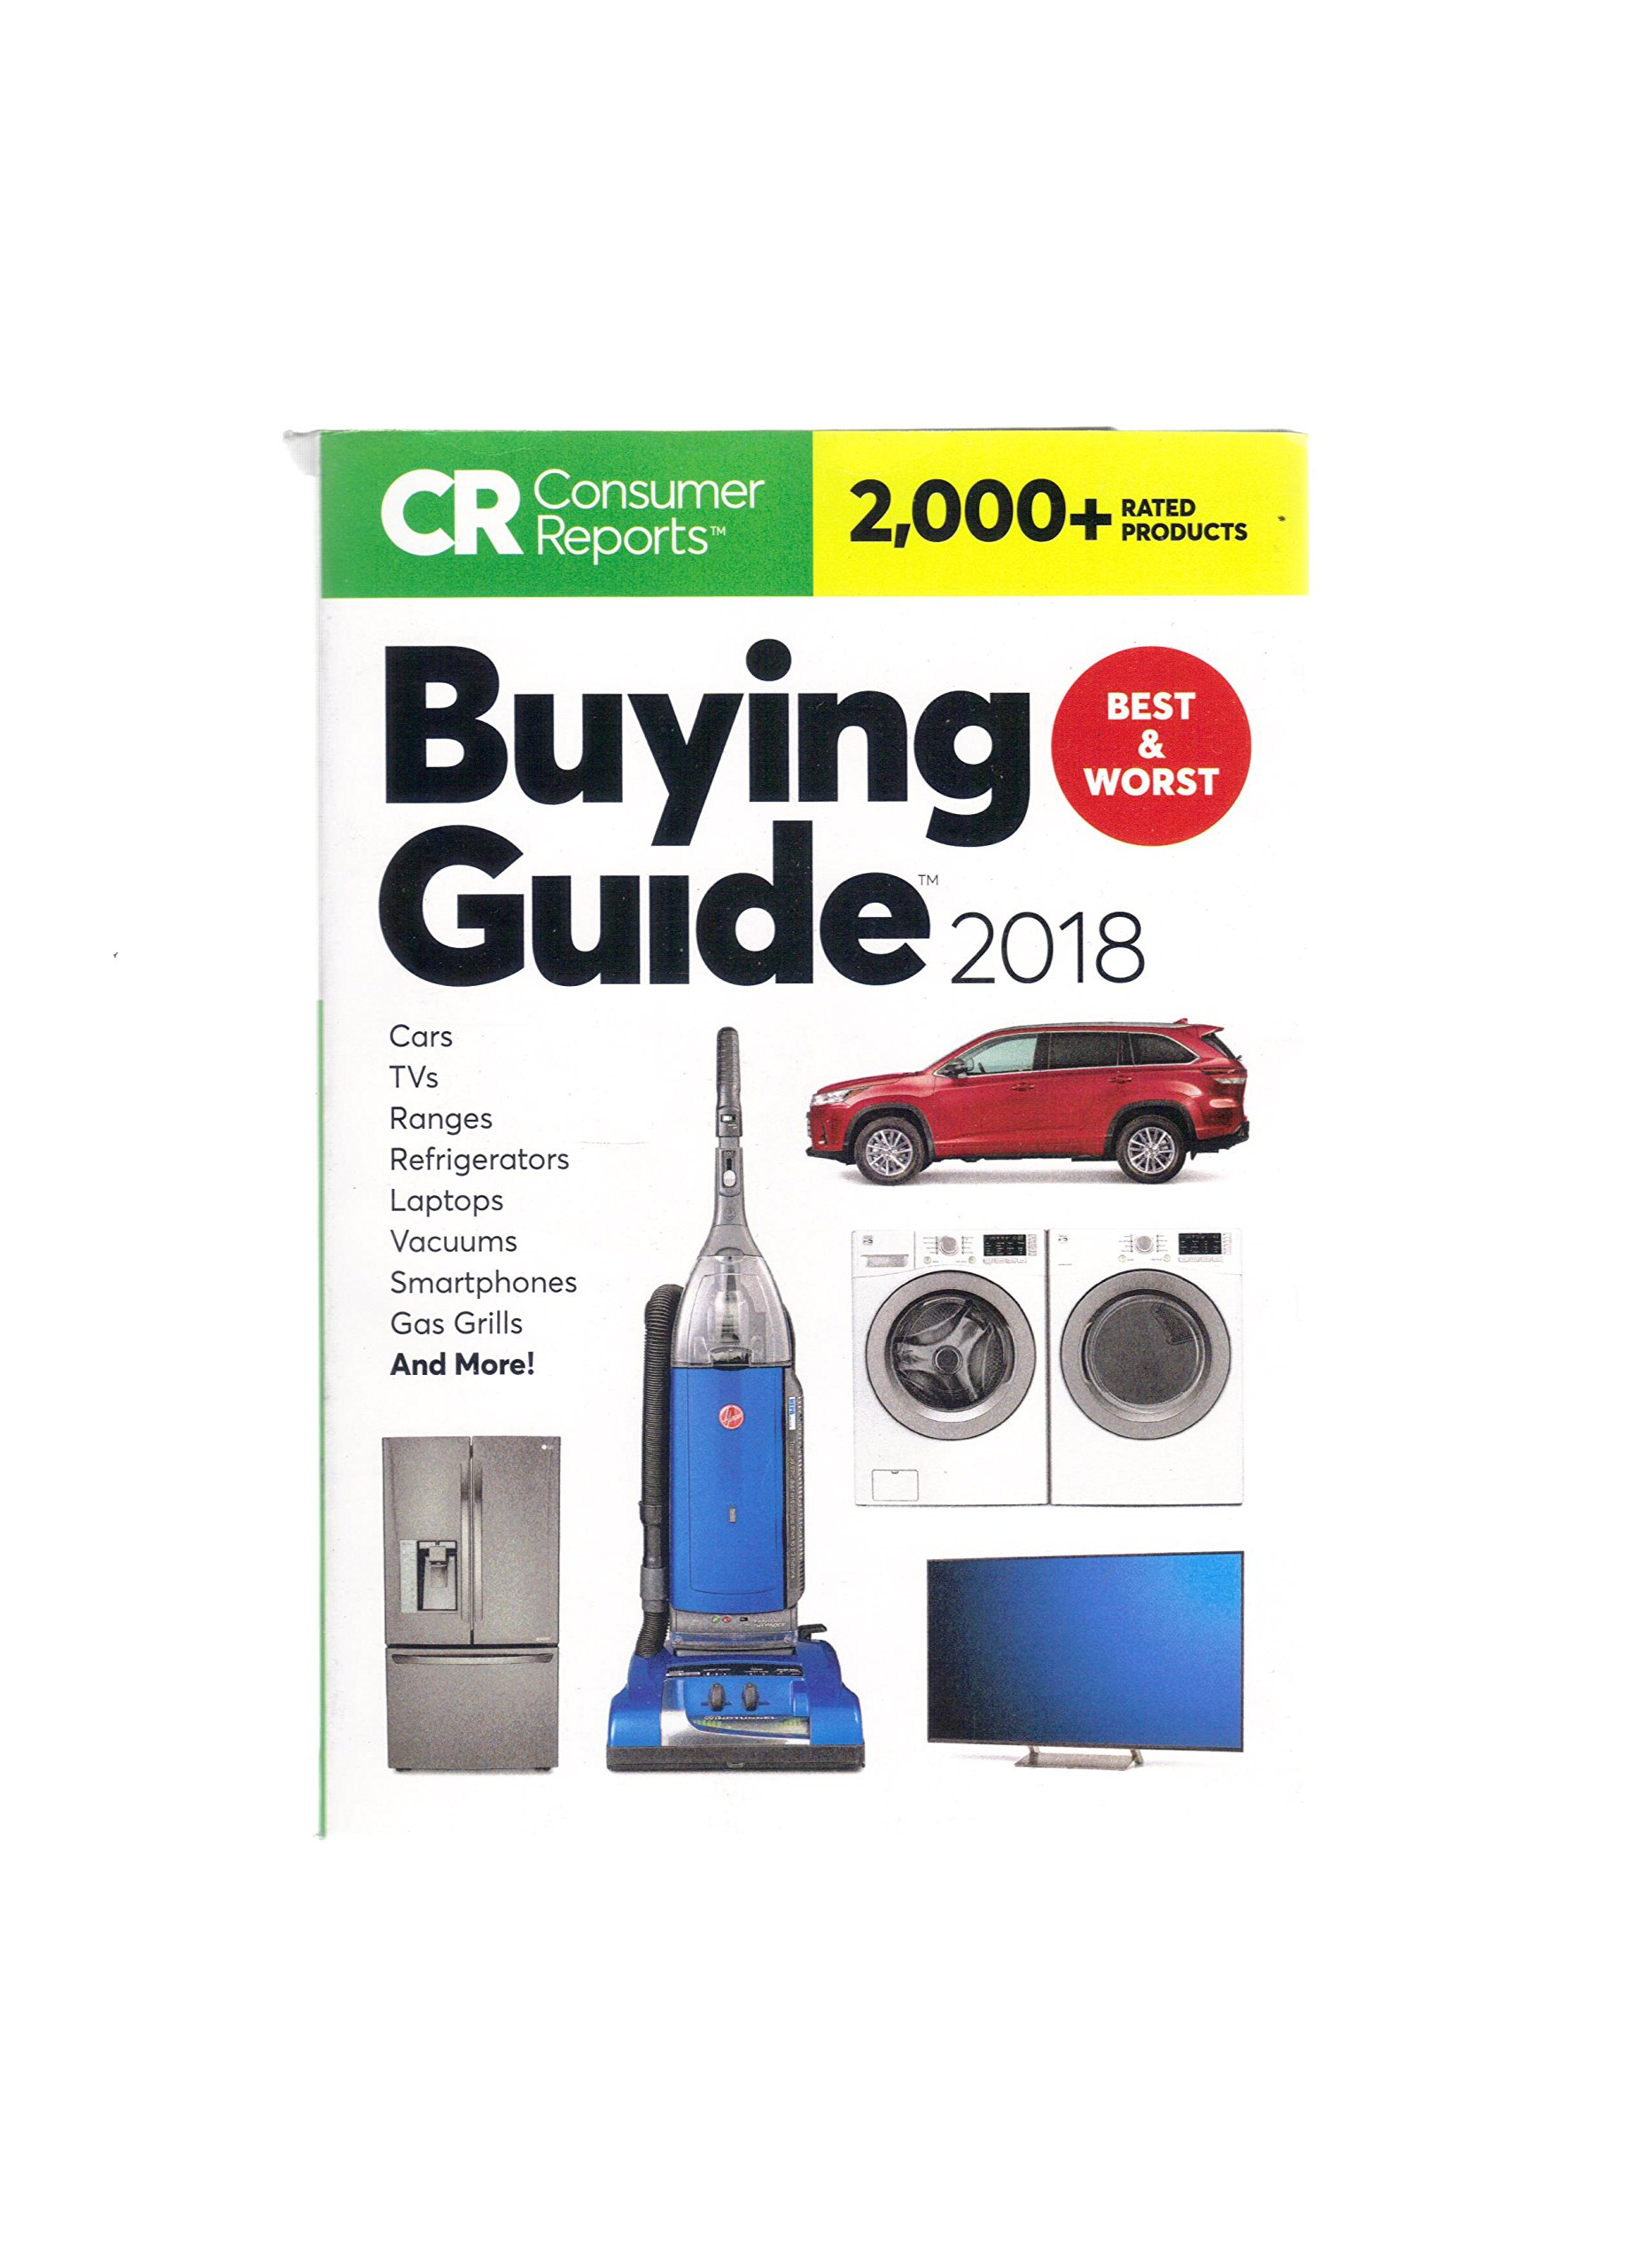 consumer reports buying guide 2018 amazon com books rh amazon com consumer reports laptop buying guide 2018 consumer reports laptop buying guide 2017